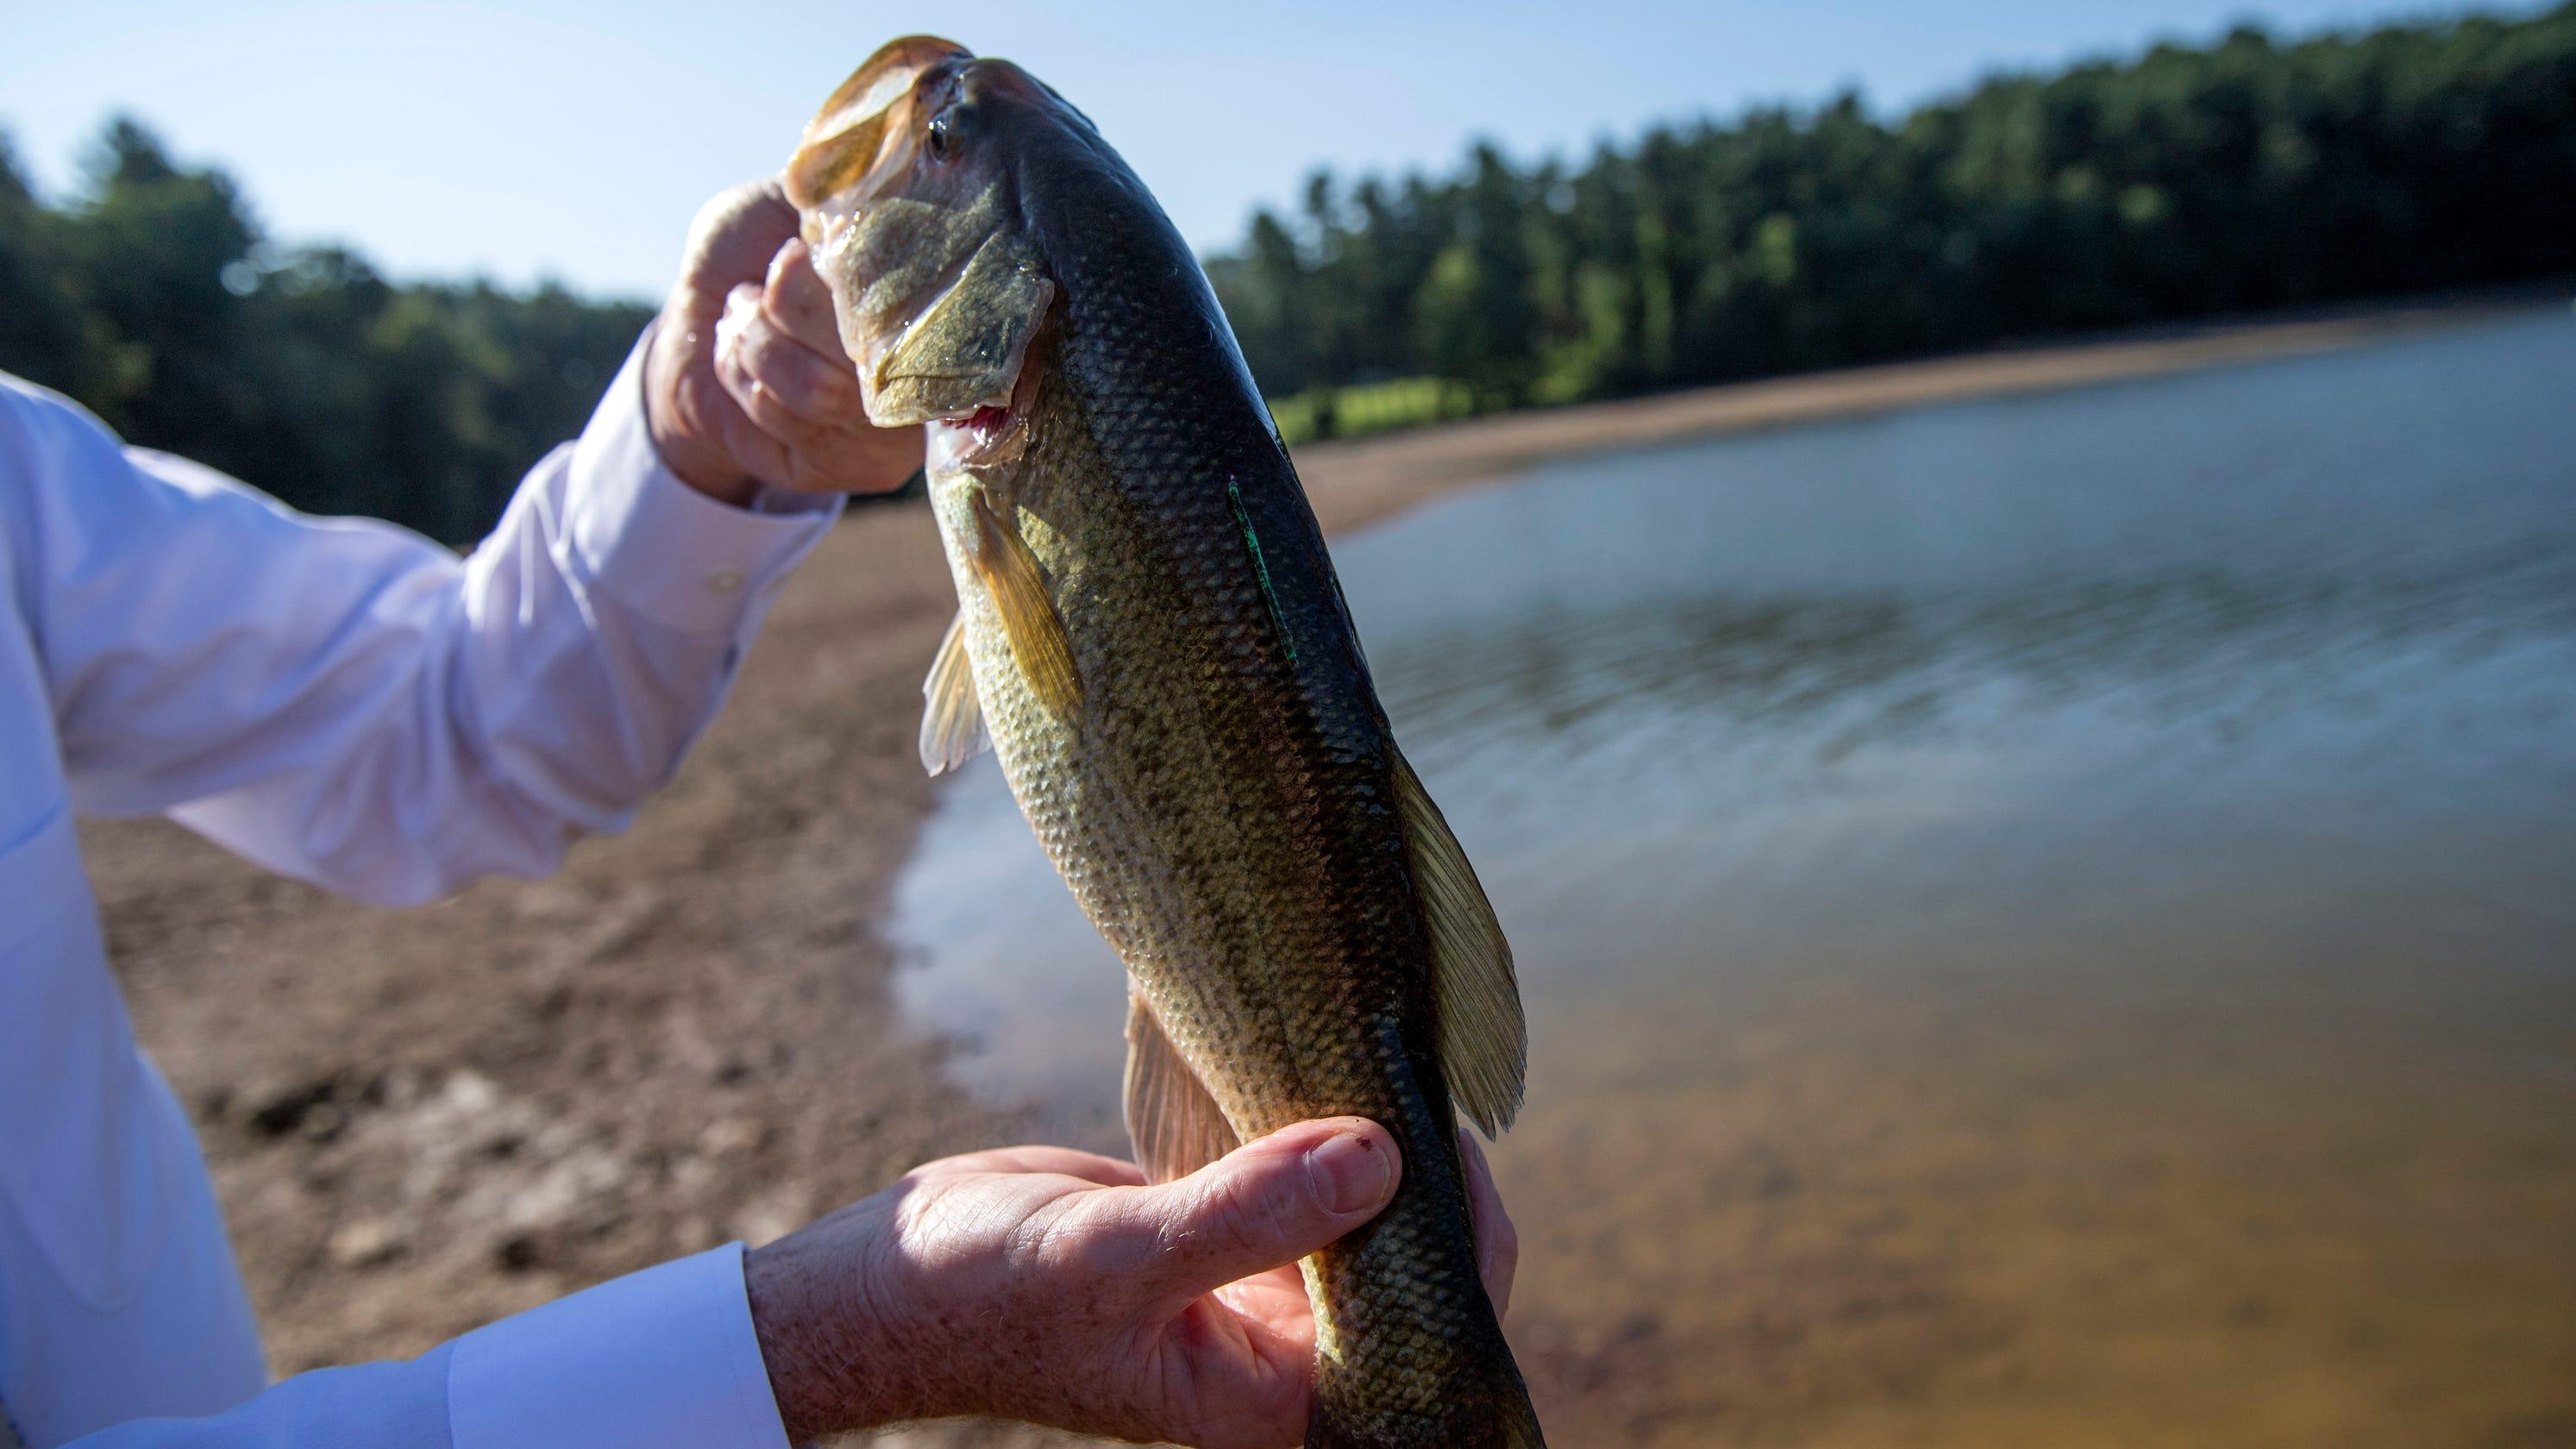 Fishing: Susquehanna River smallmouth bass population growing